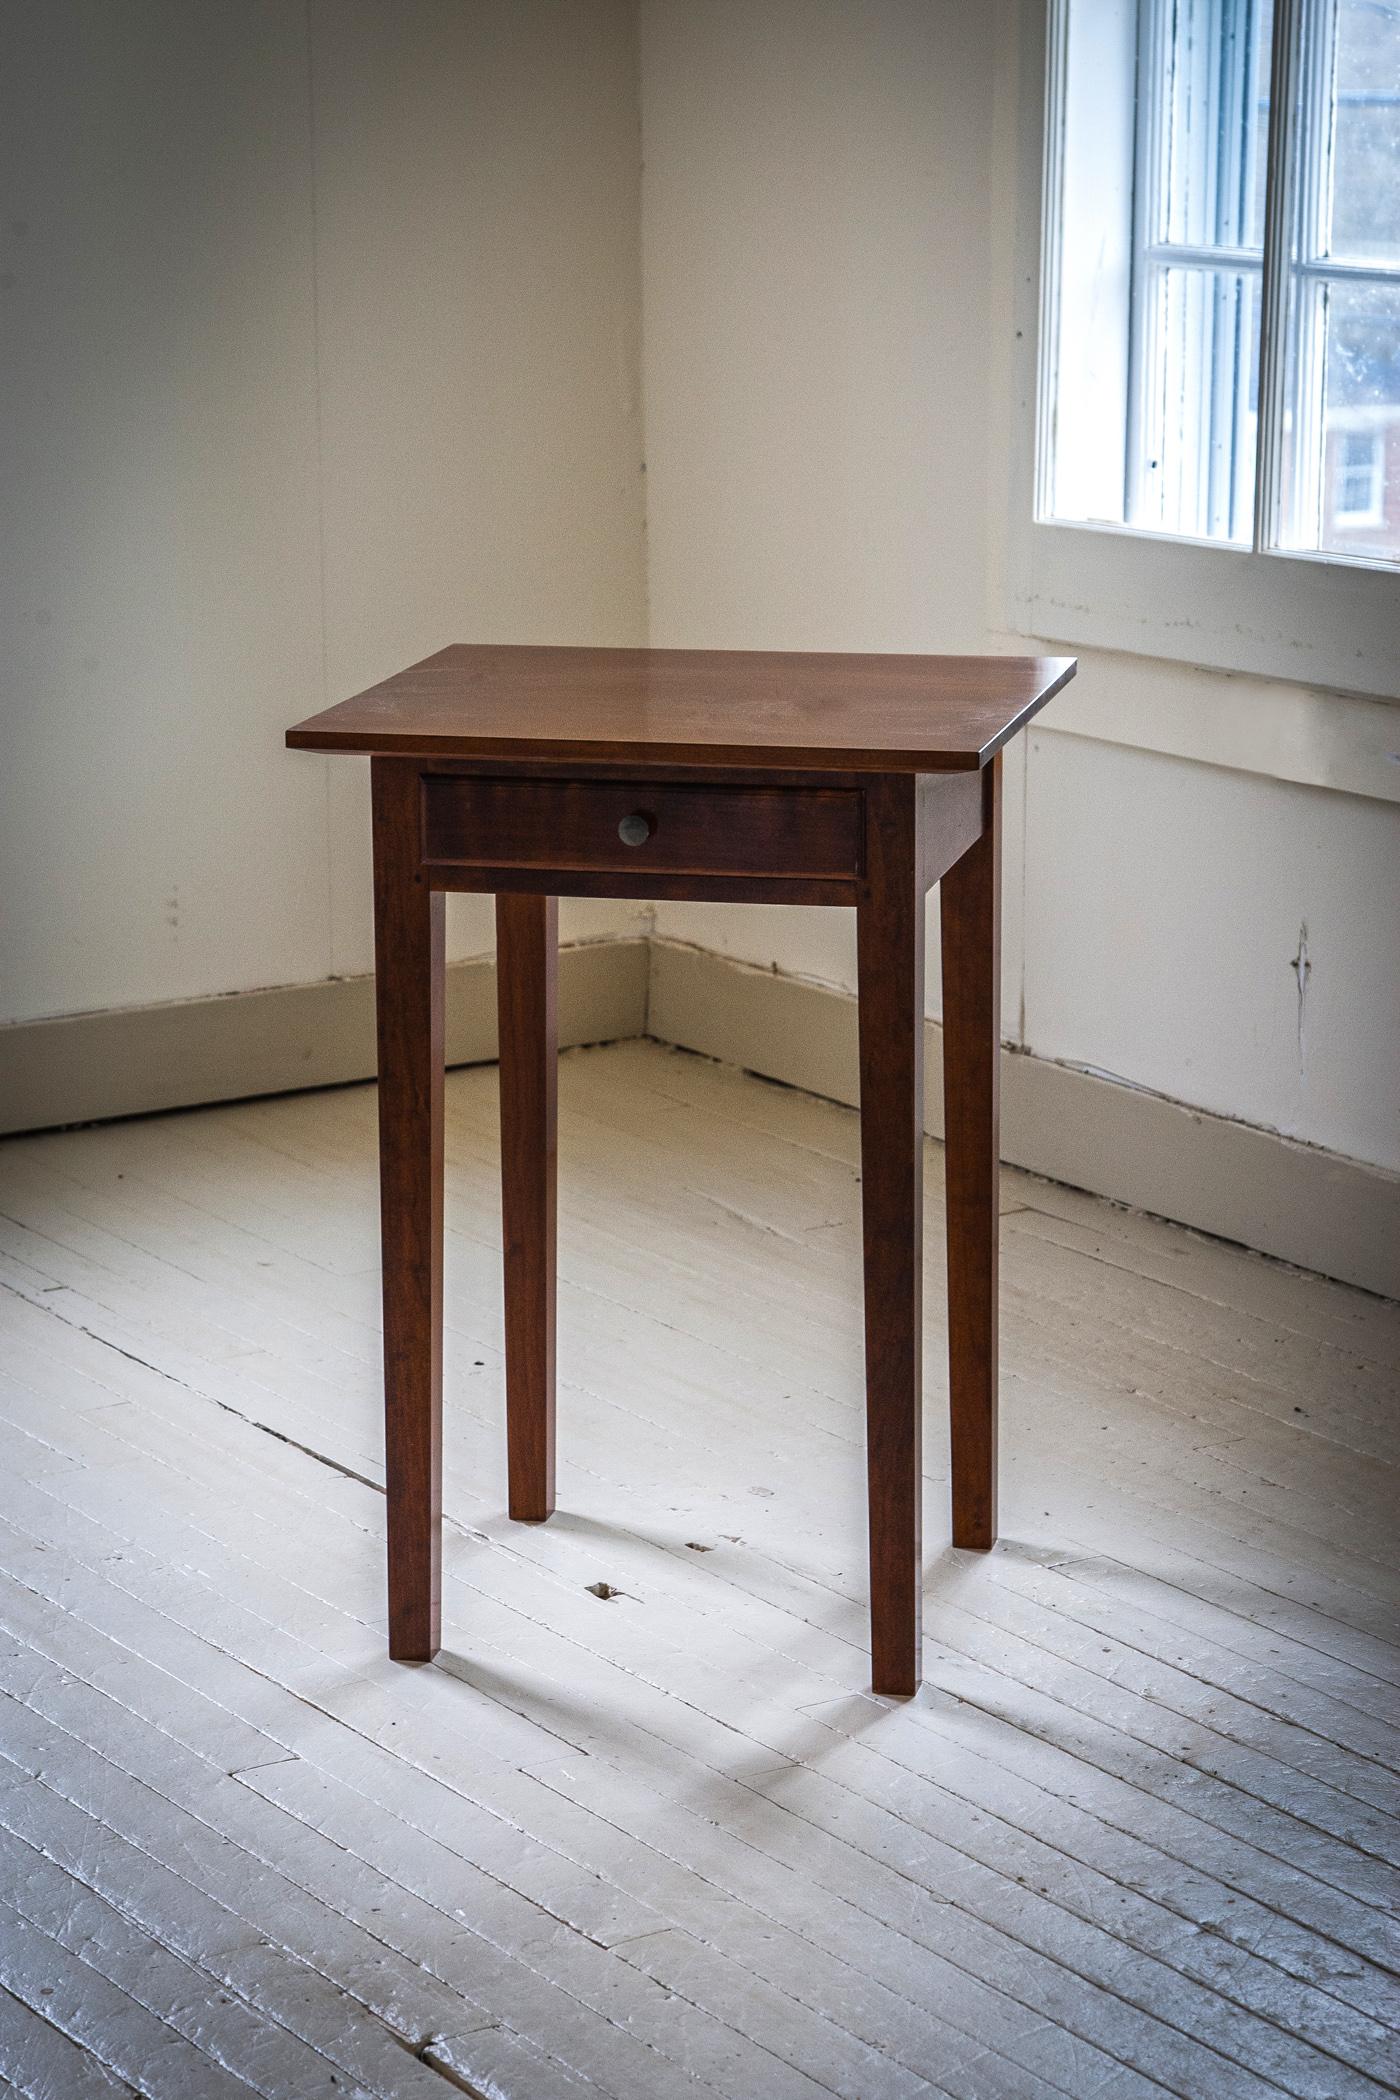 table_nightstand_bedside.jpg